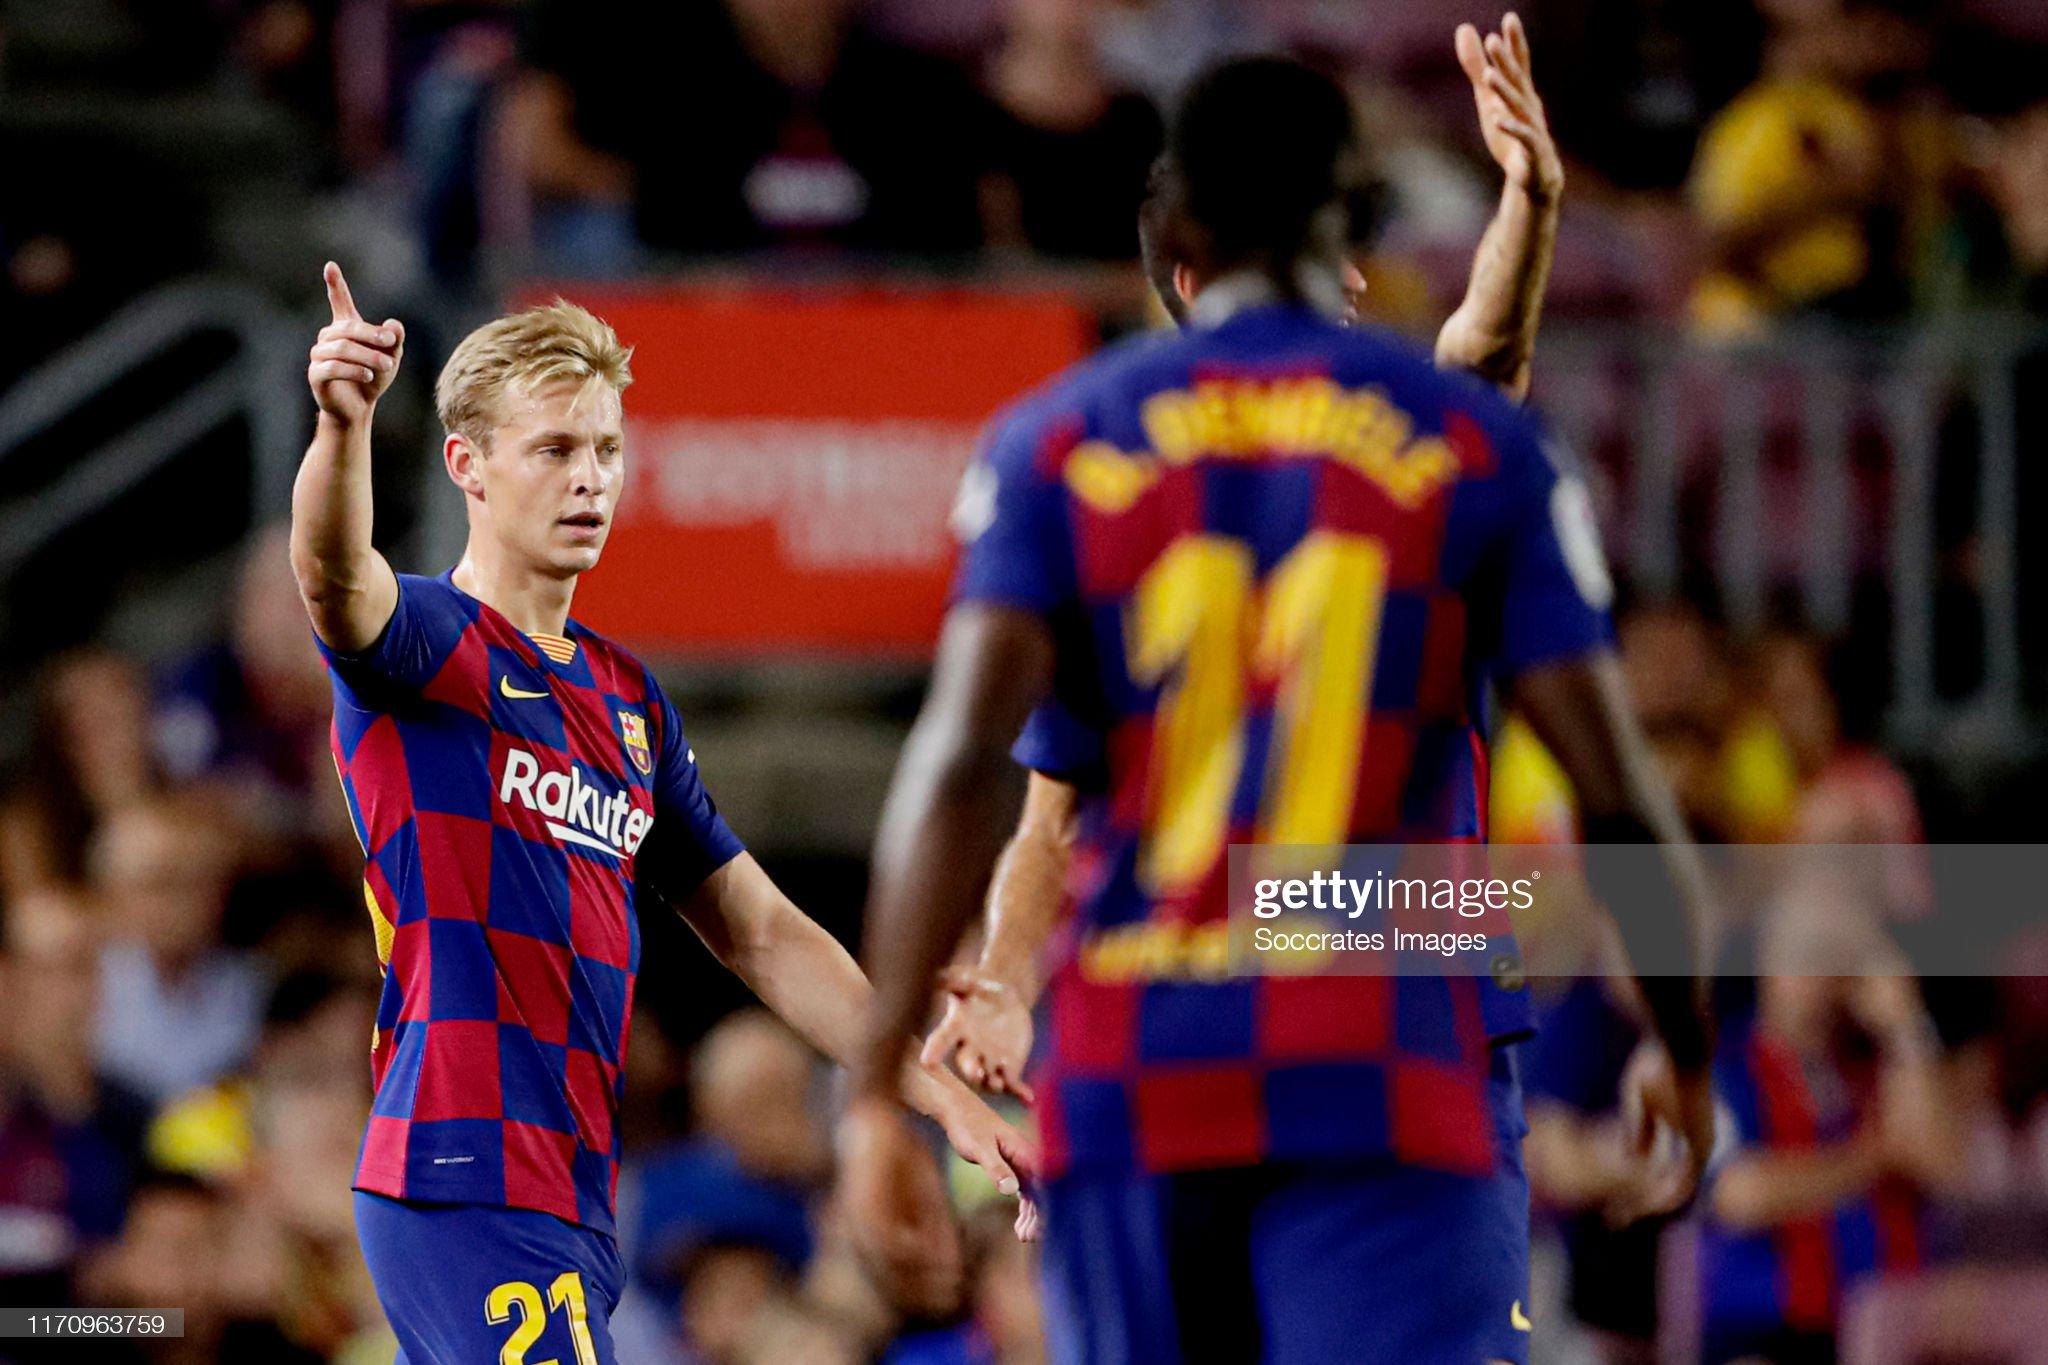 صور مباراة : برشلونة - فياريال 2-1 ( 24-09-2019 )  Frenkie-de-jong-of-fc-barcelona-during-the-la-liga-santander-match-picture-id1170963759?s=2048x2048